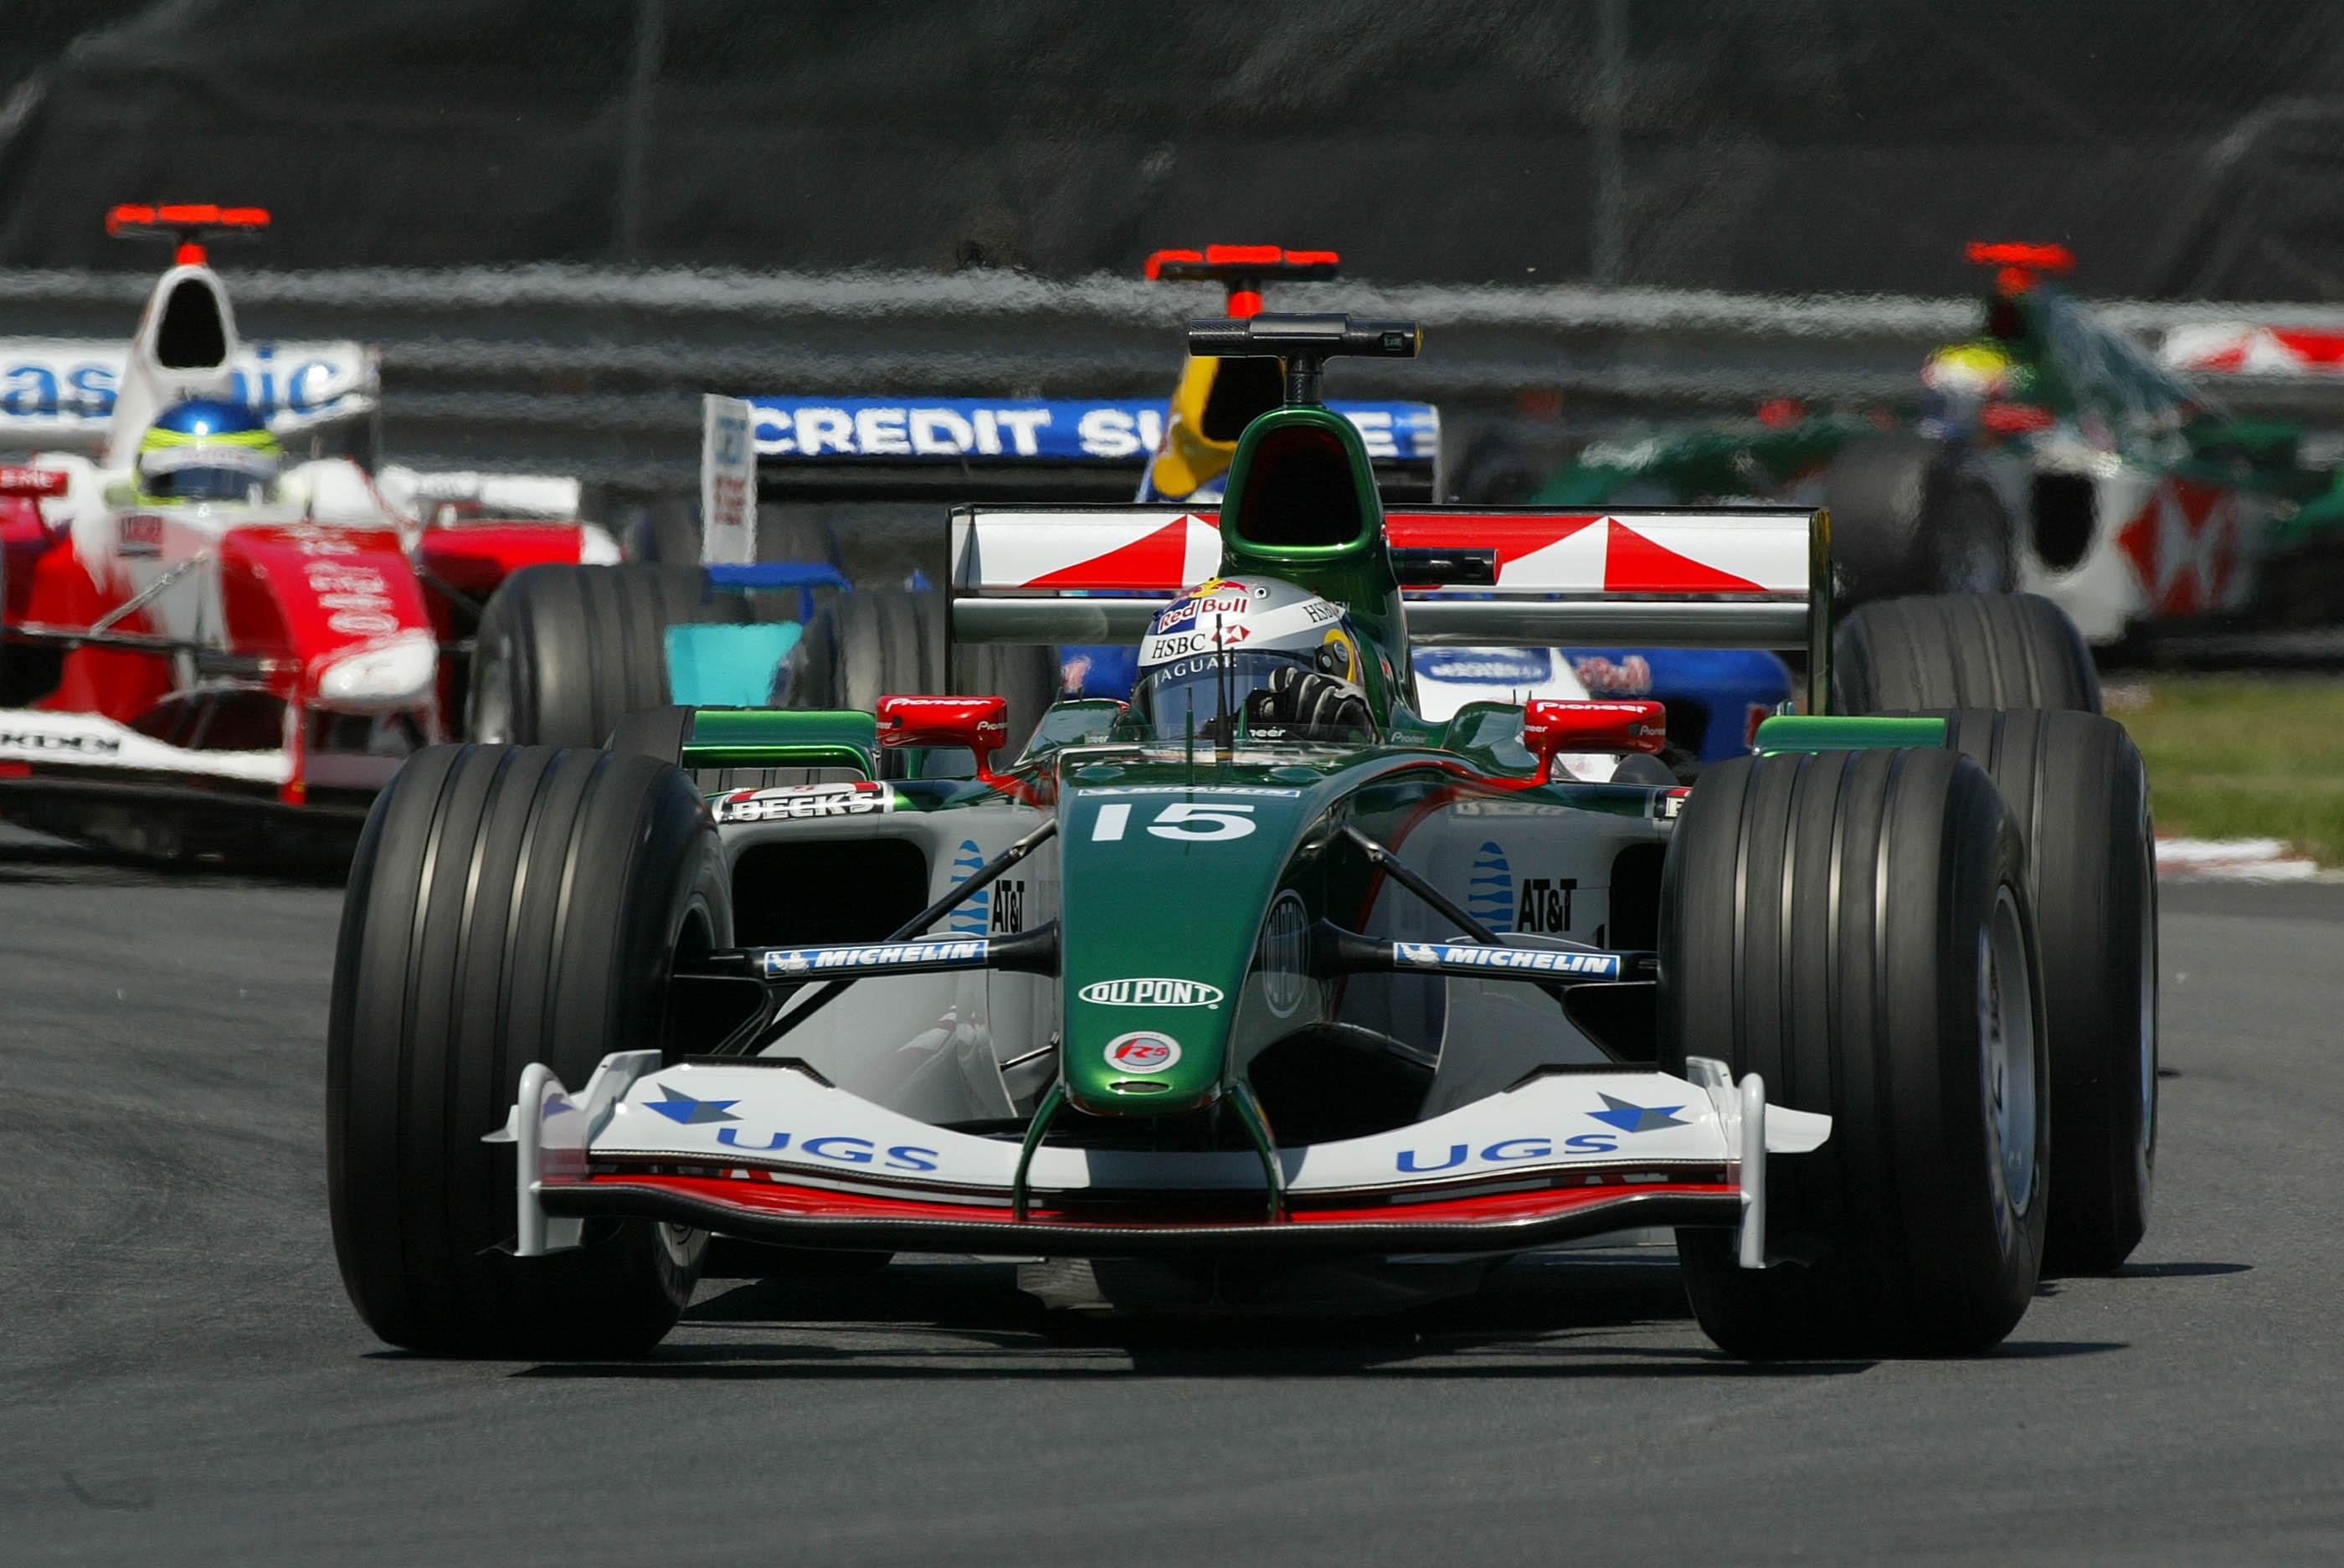 Christian Klien Jaguar Canadian Grand Prix 2004